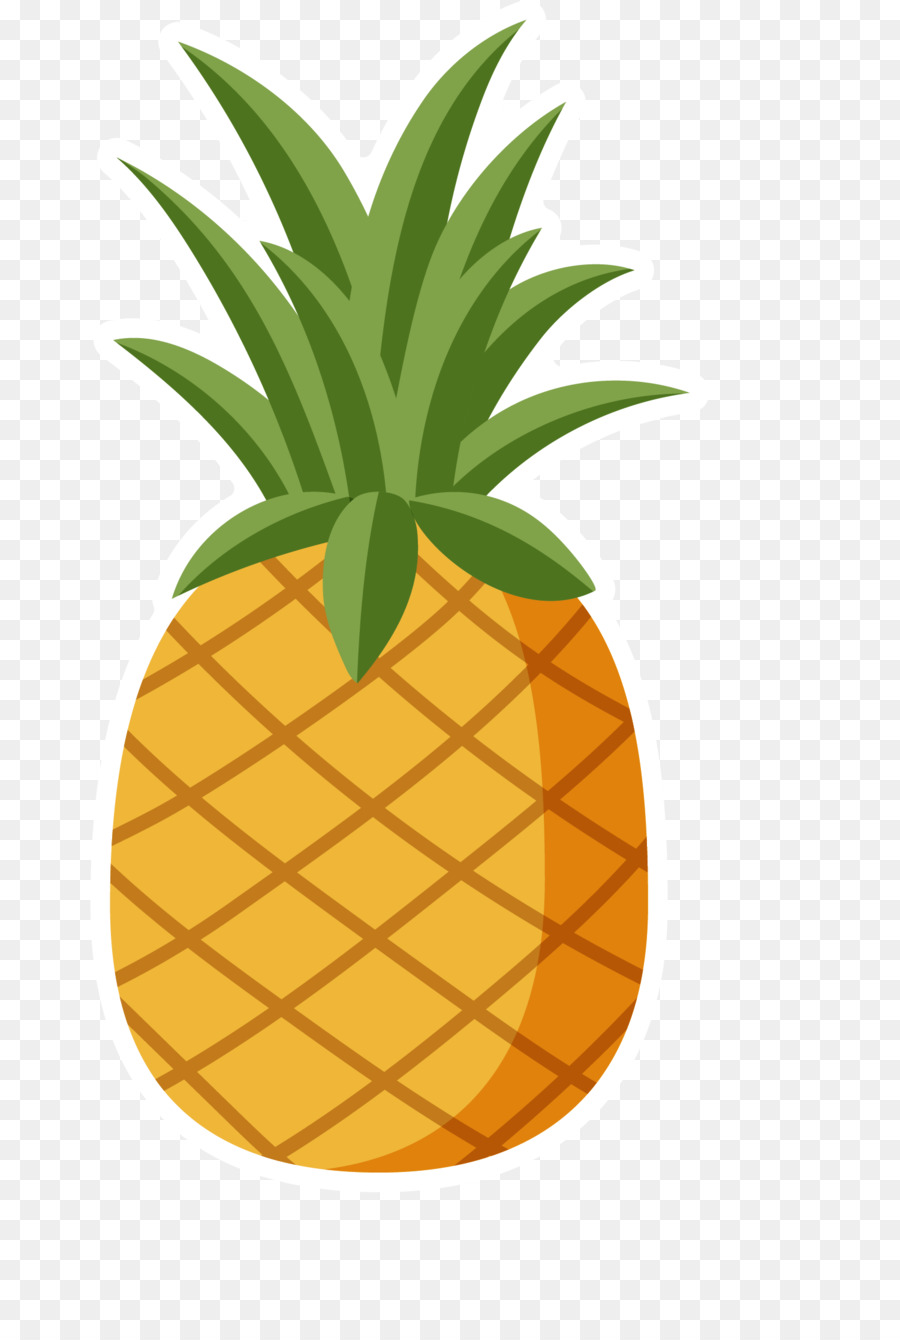 Clipart pineapple. Hawaiian pizza clip art